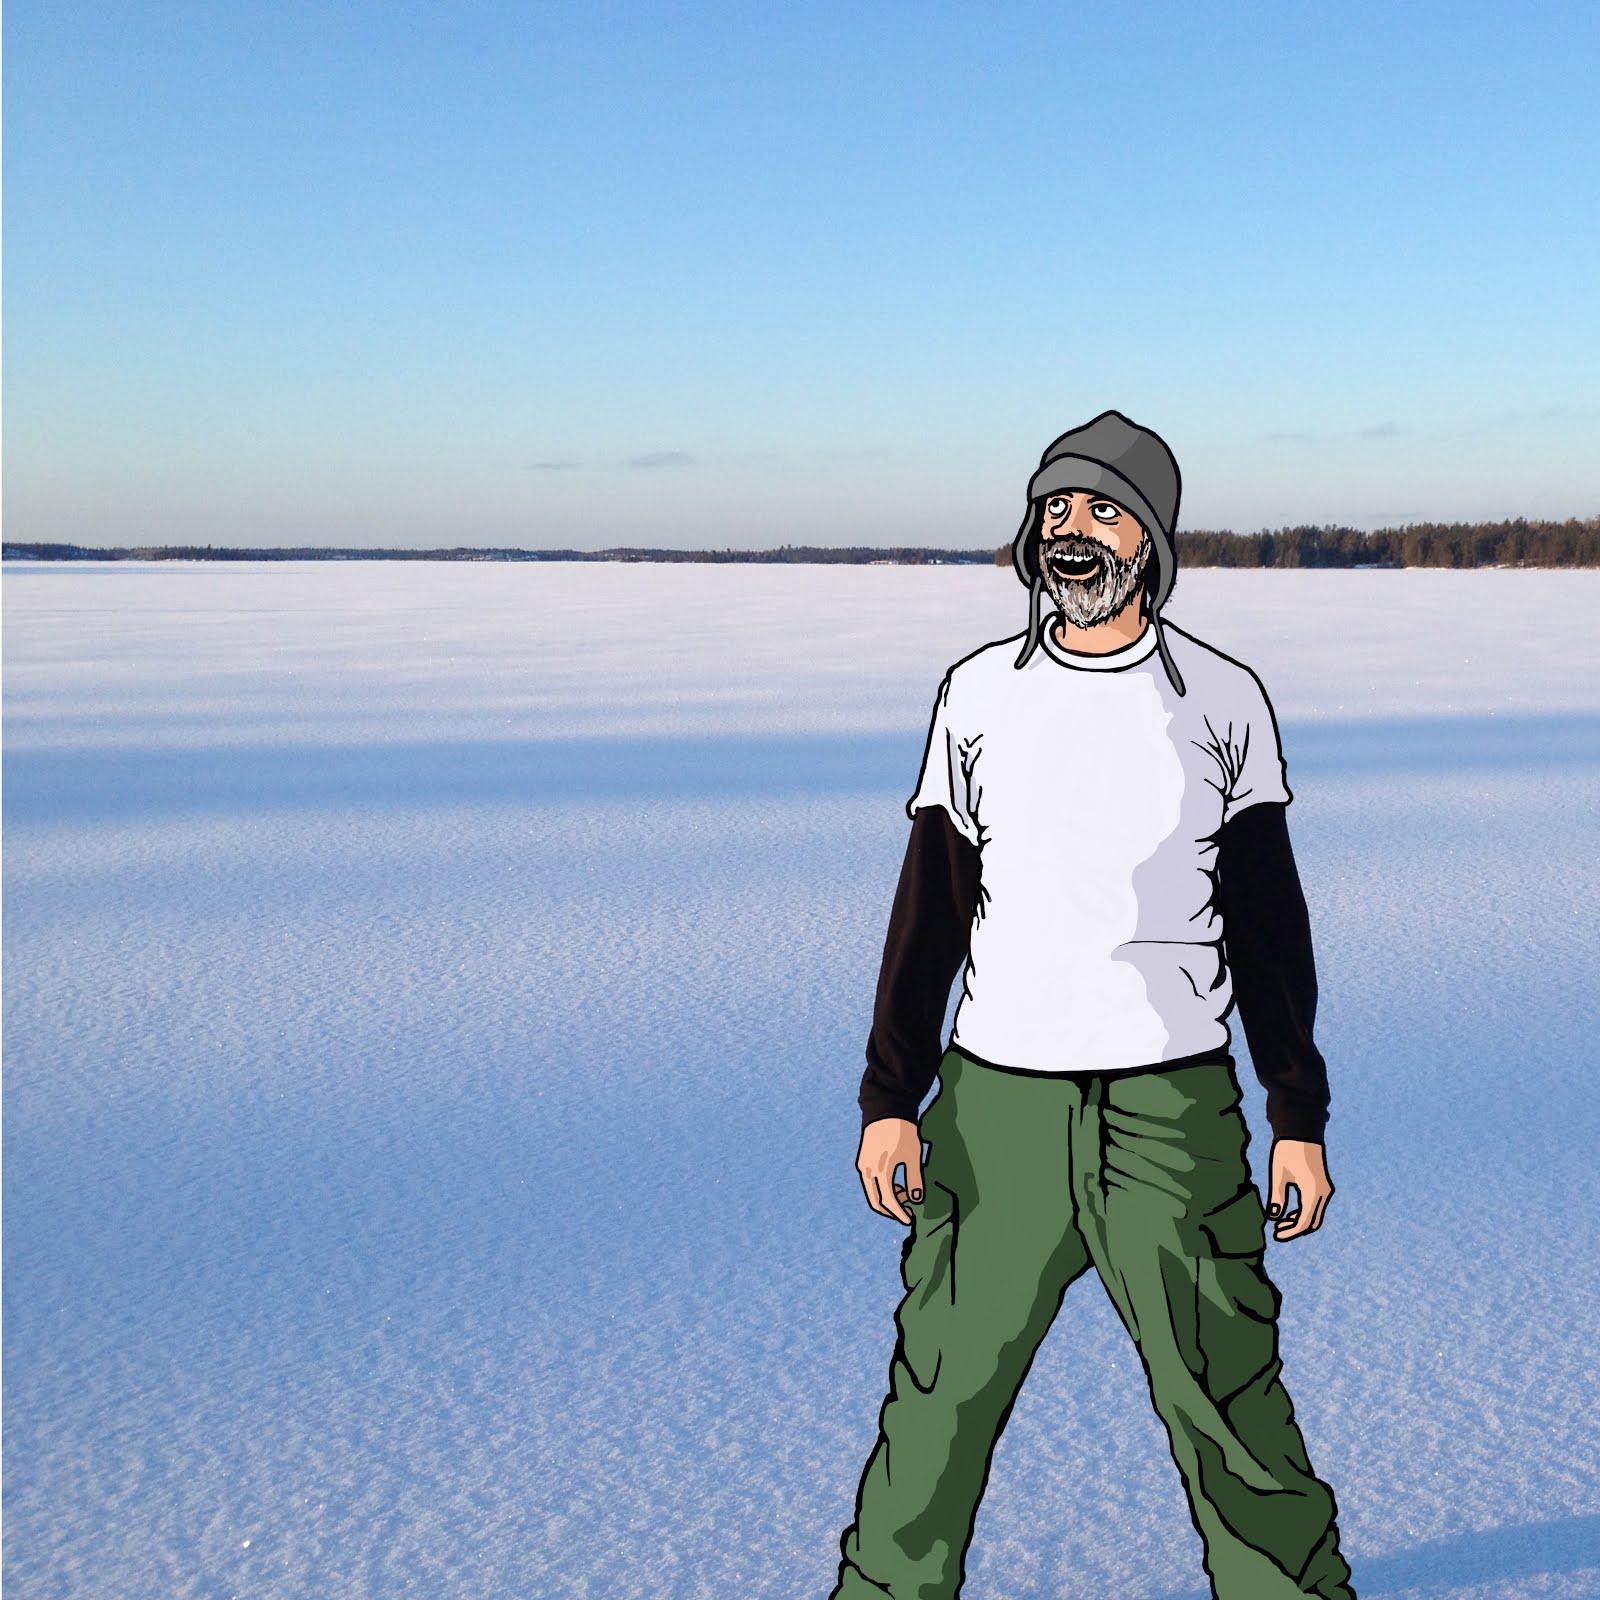 Shoe Lake 2012